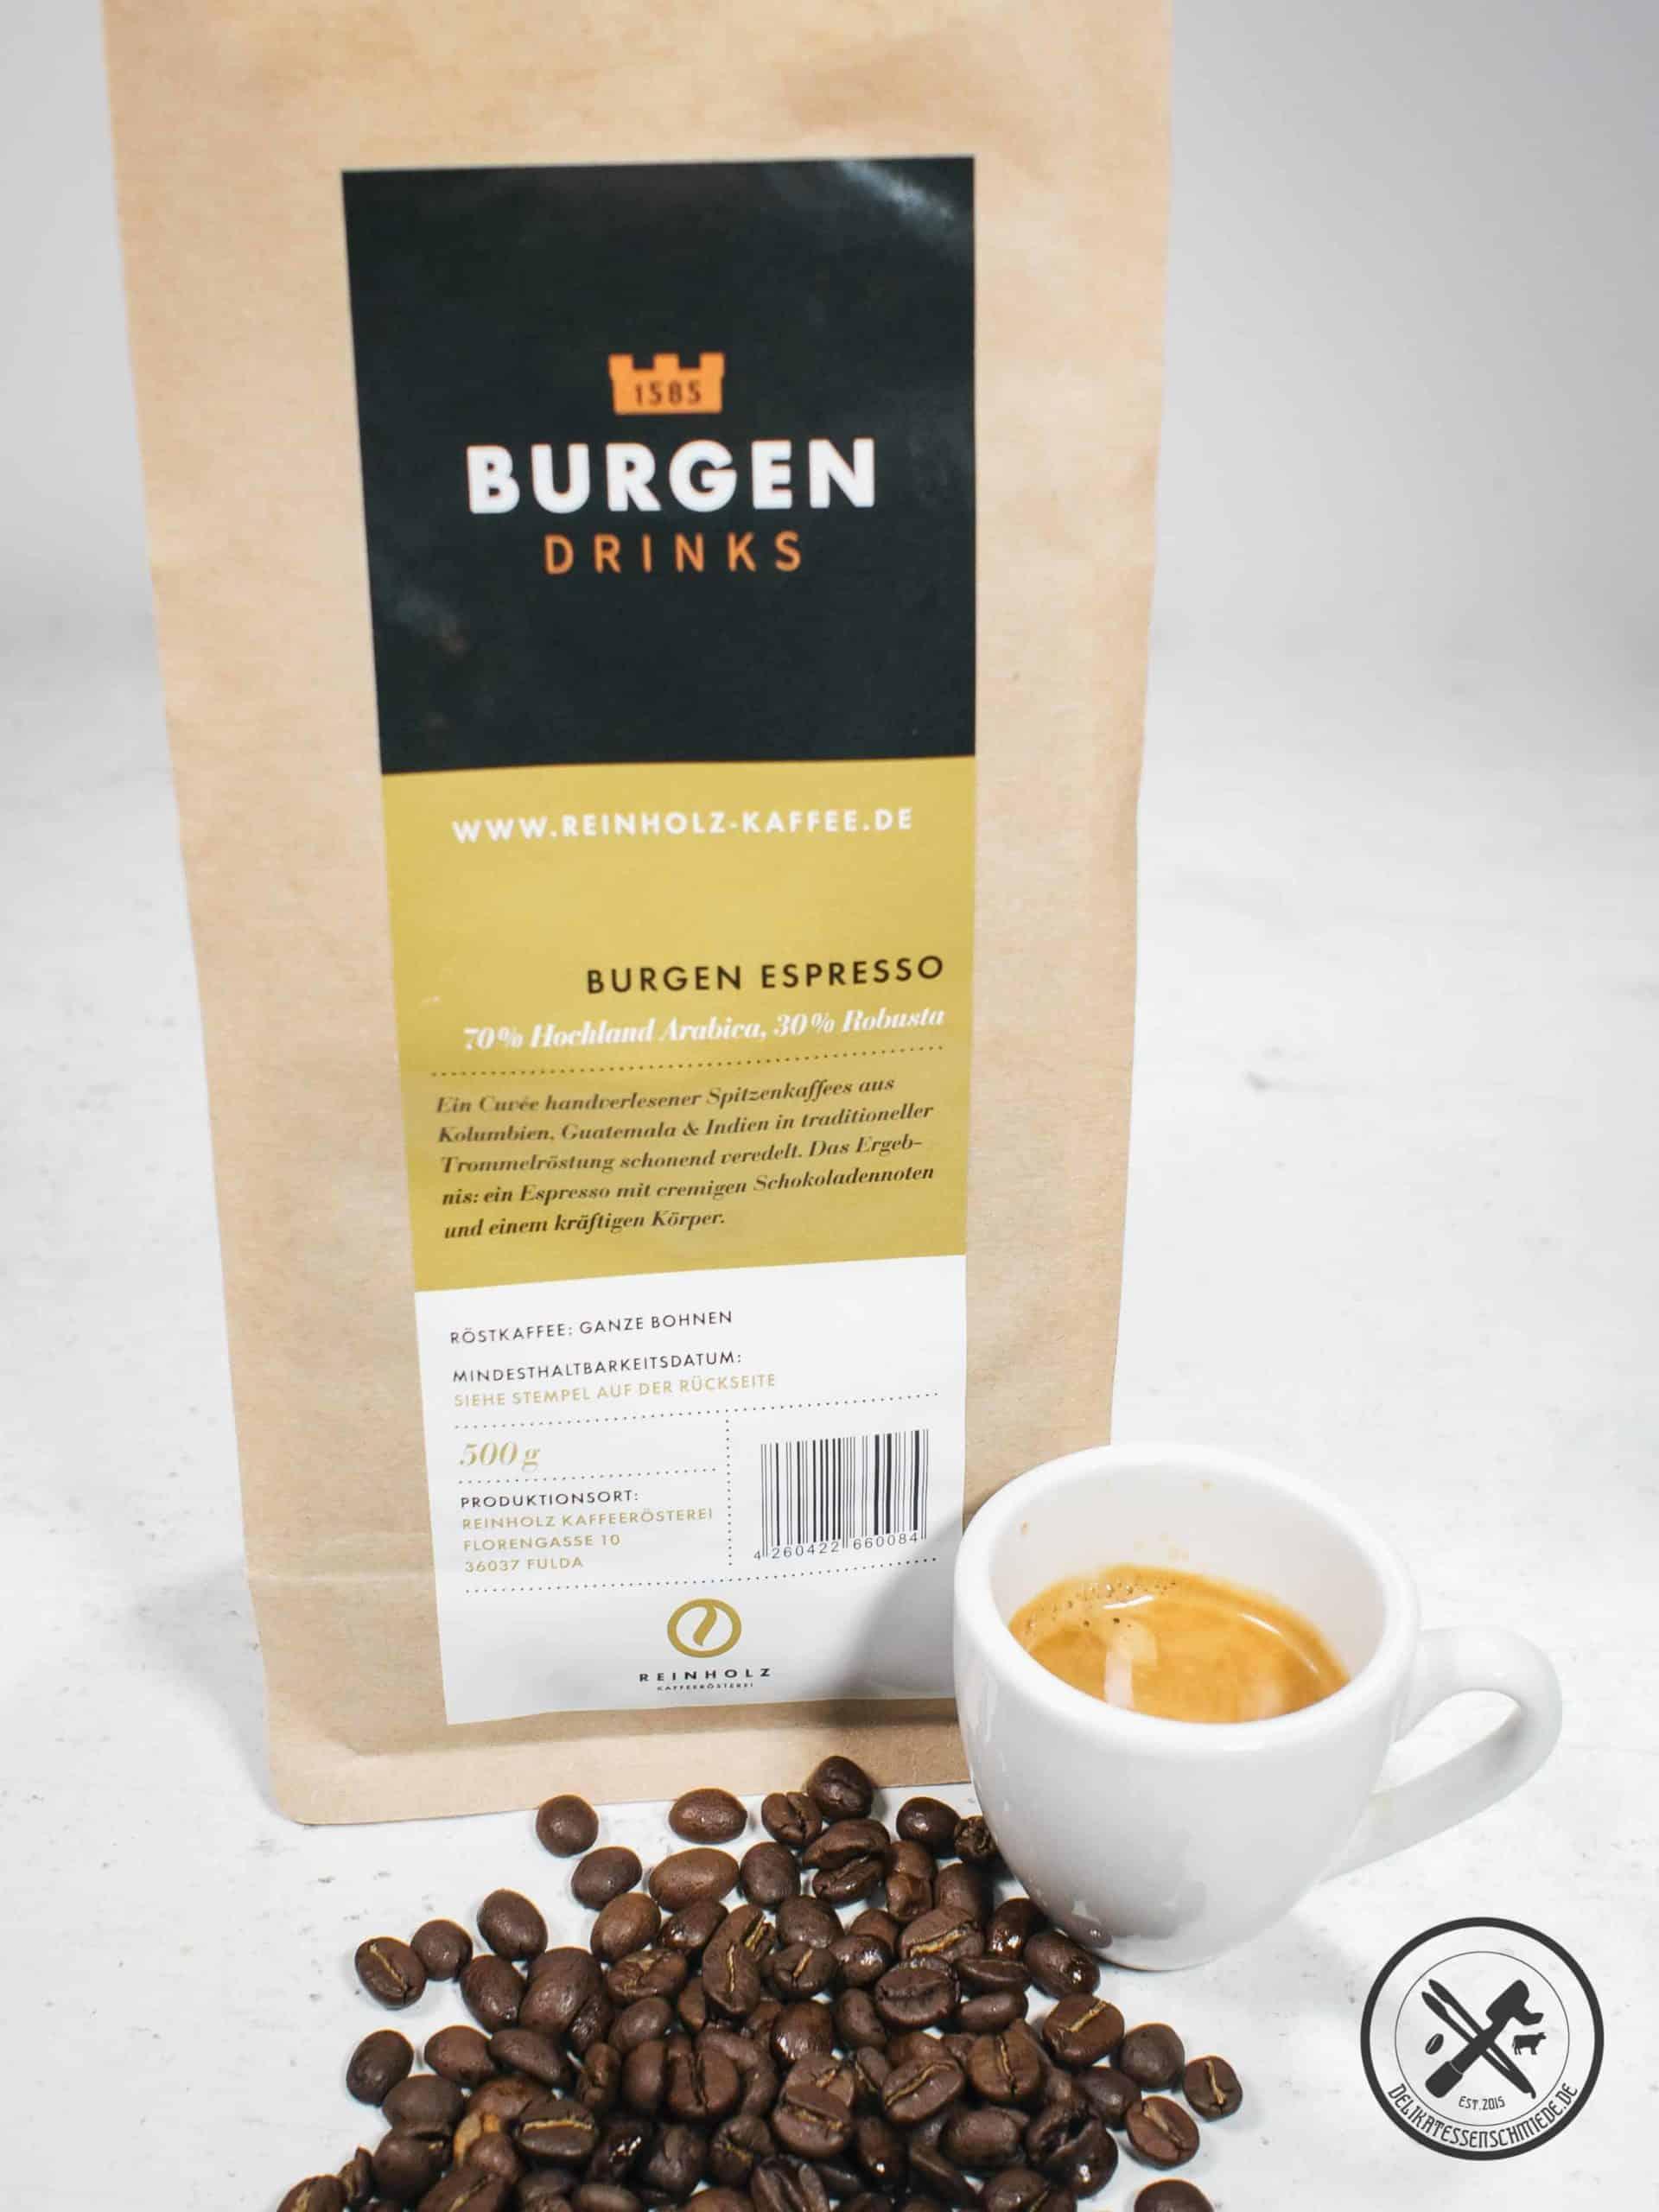 Burgen_Espresso-4